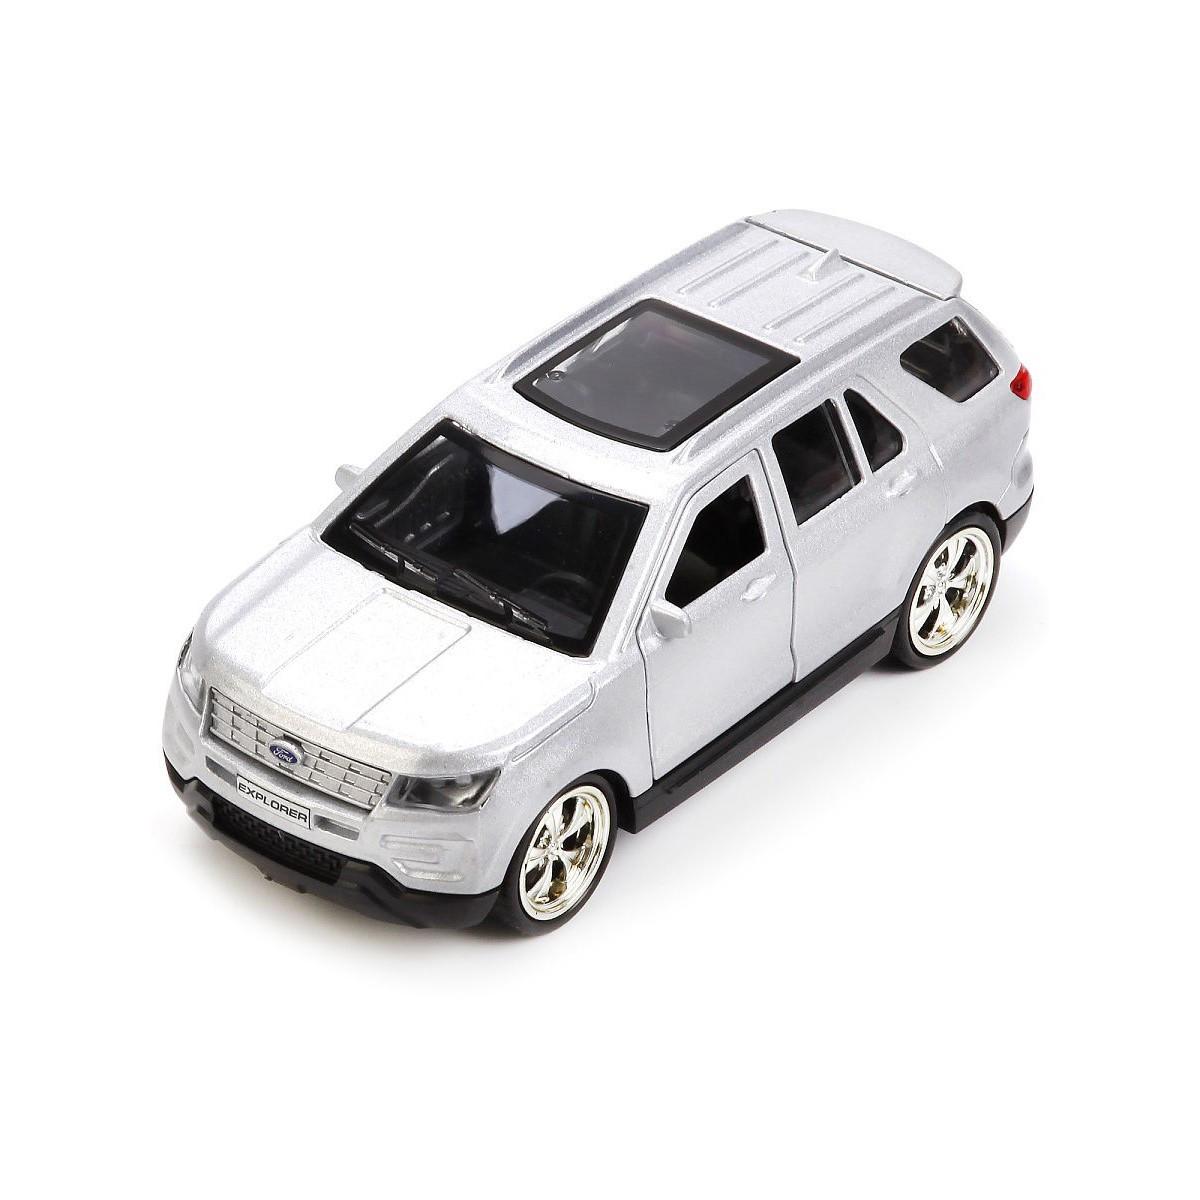 Автомодель - FORD EXPLORER (1:32, сірий) Technopark EXPLORER-MIXG